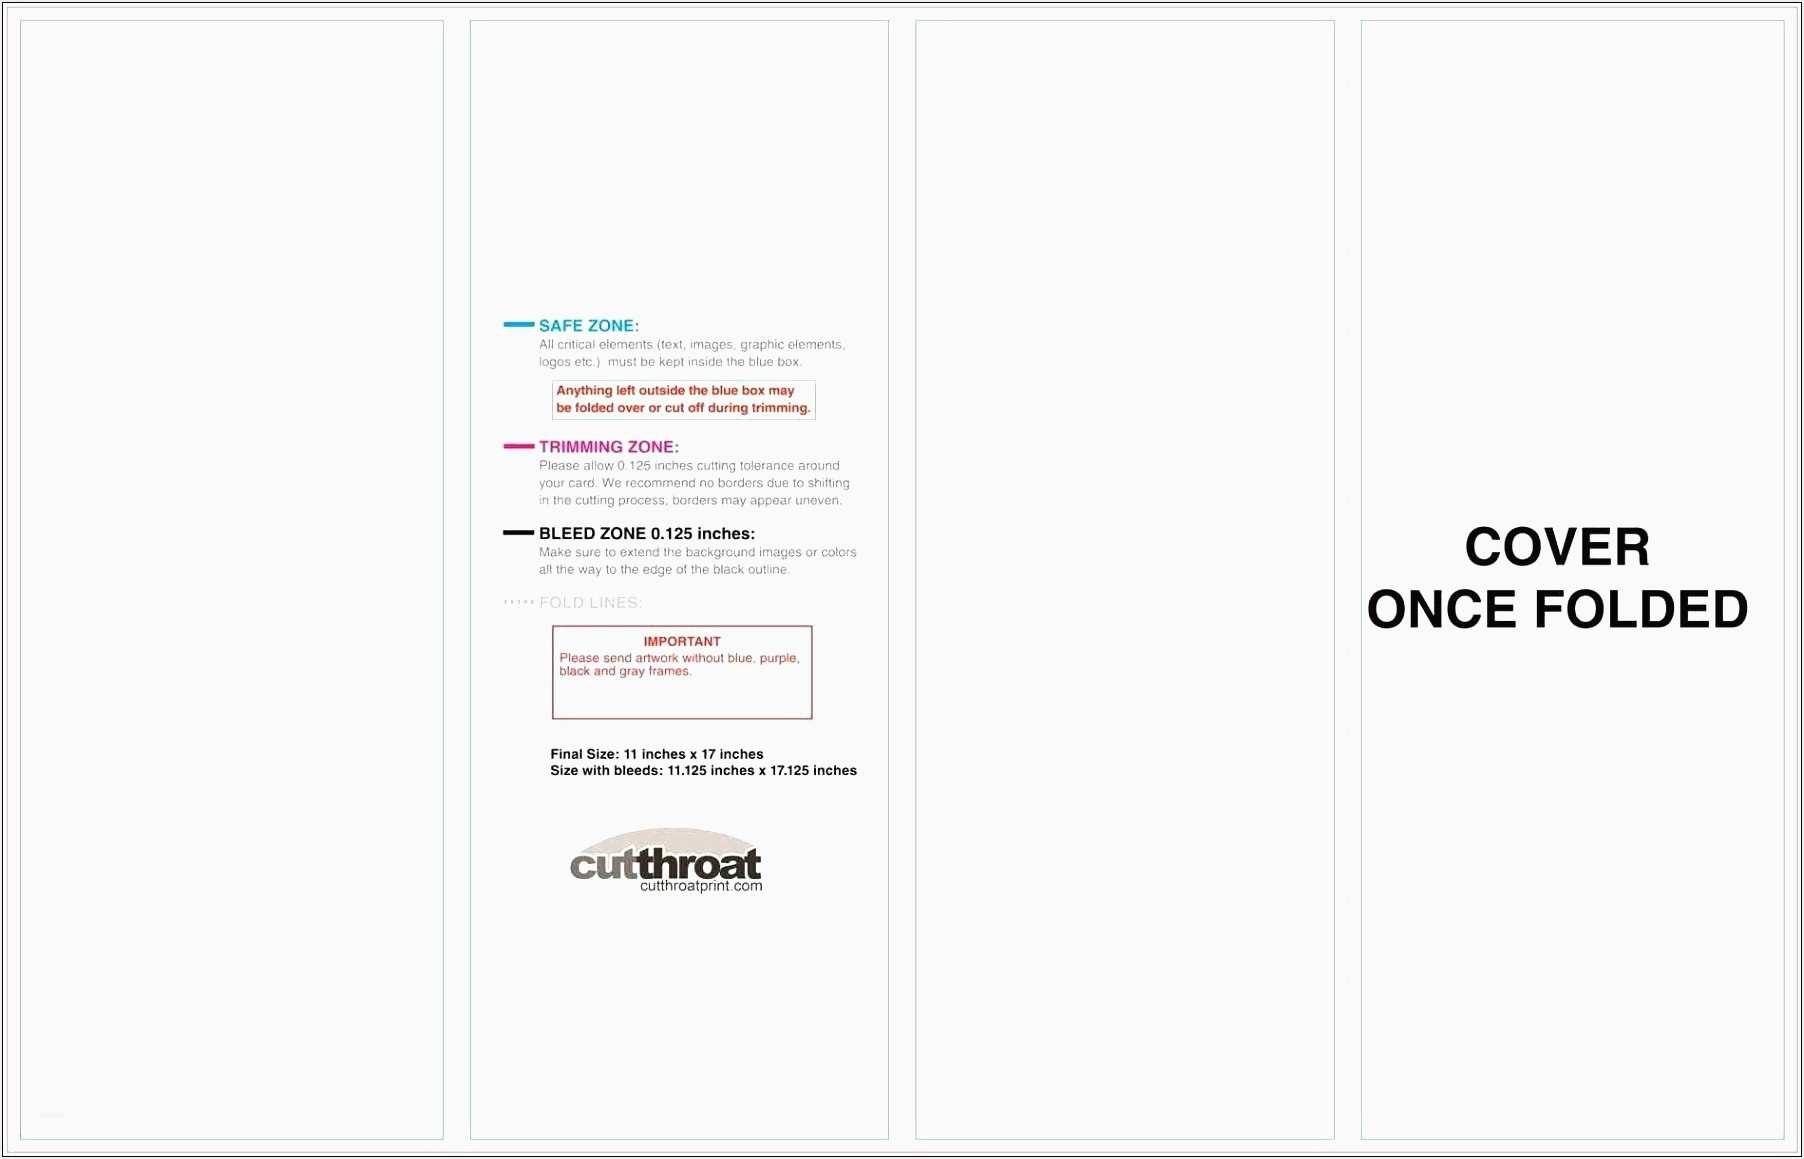 Blank Quarter Fold Card Template  Lascazuelasphilly In Blank Quarter Fold Card Template